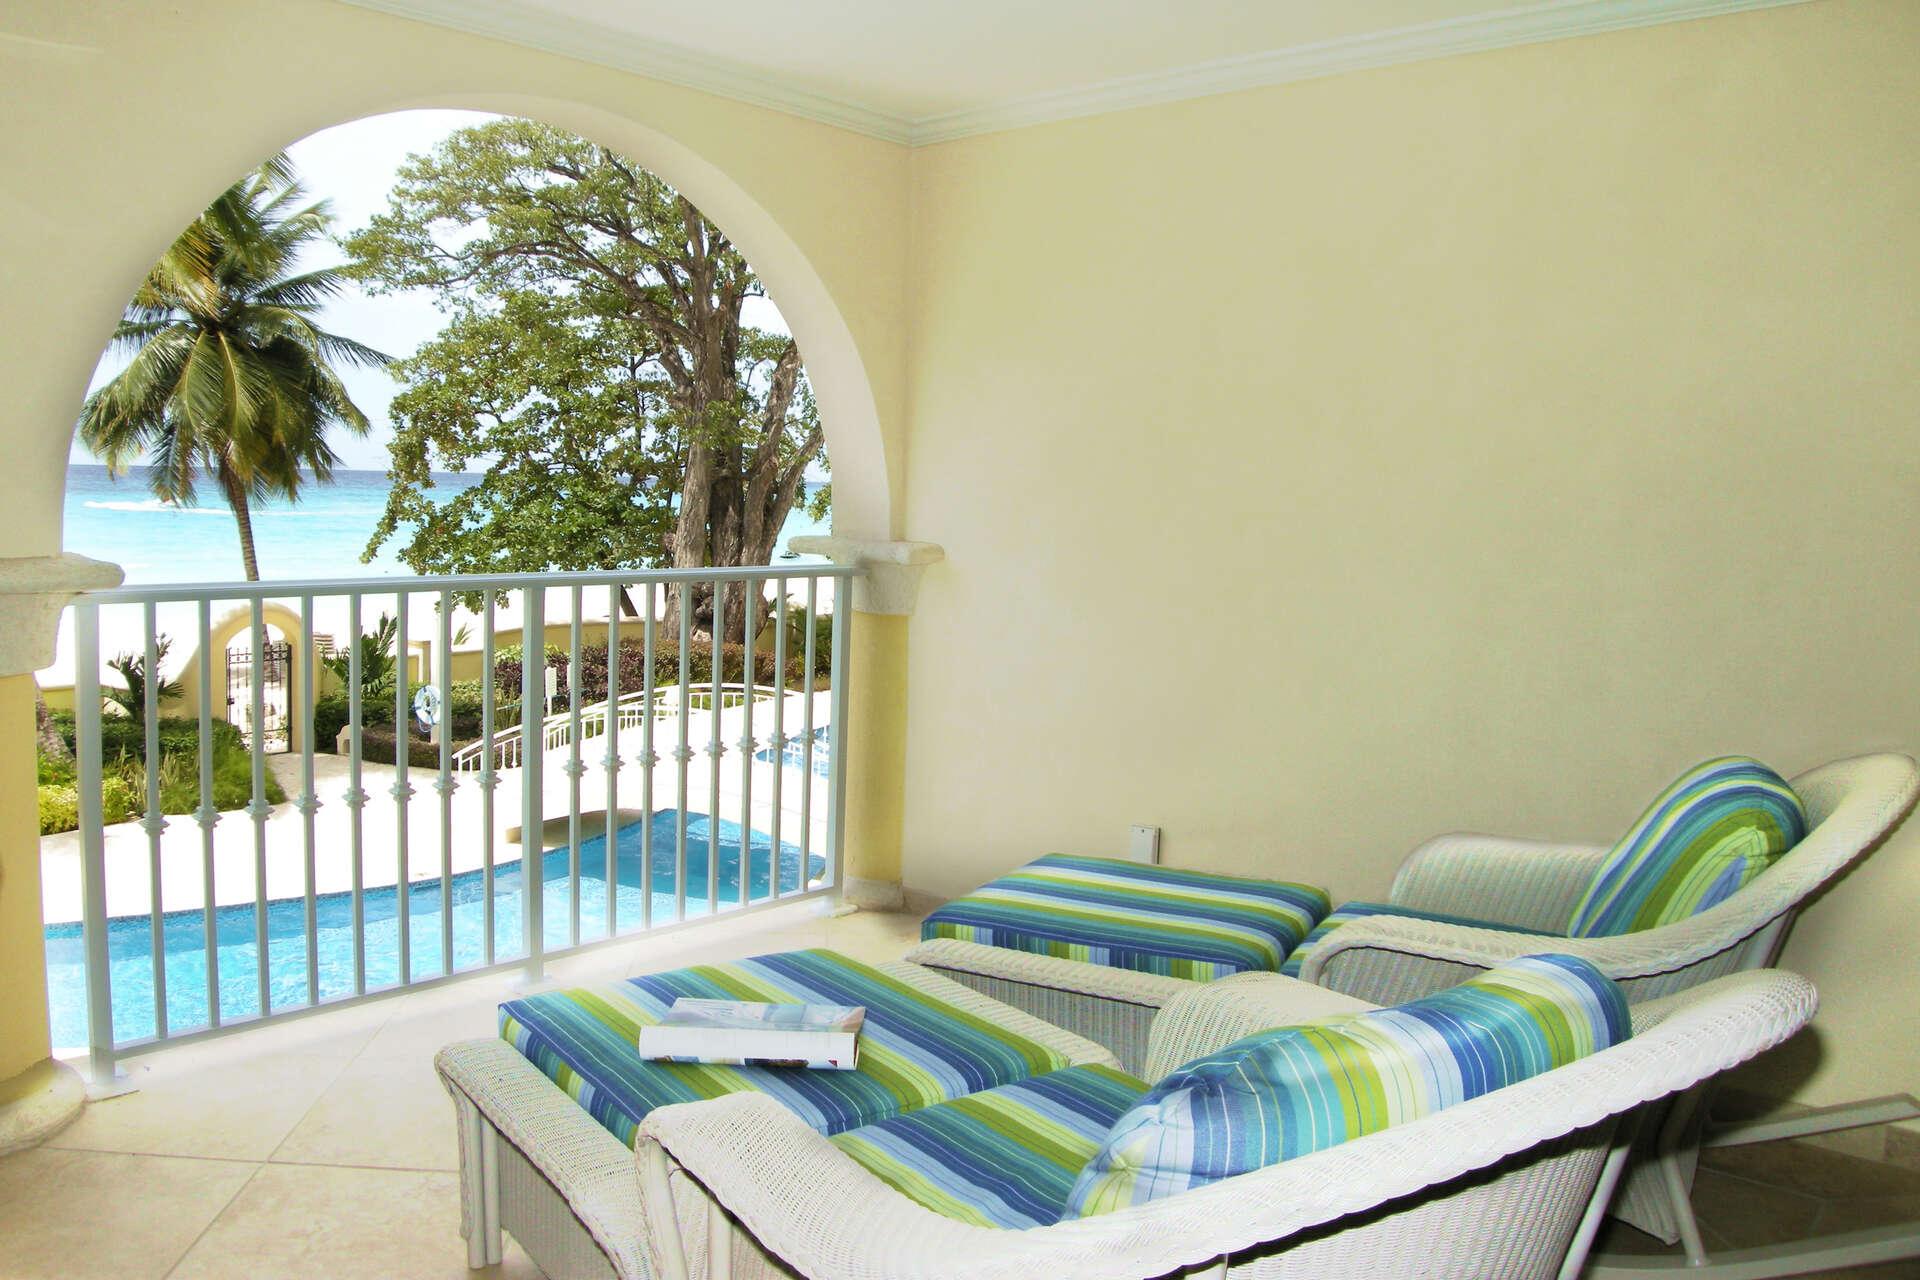 Luxury villa rentals caribbean - Barbados - Christ church - Oistins  - Sapphire Beach 114 - Image 1/11